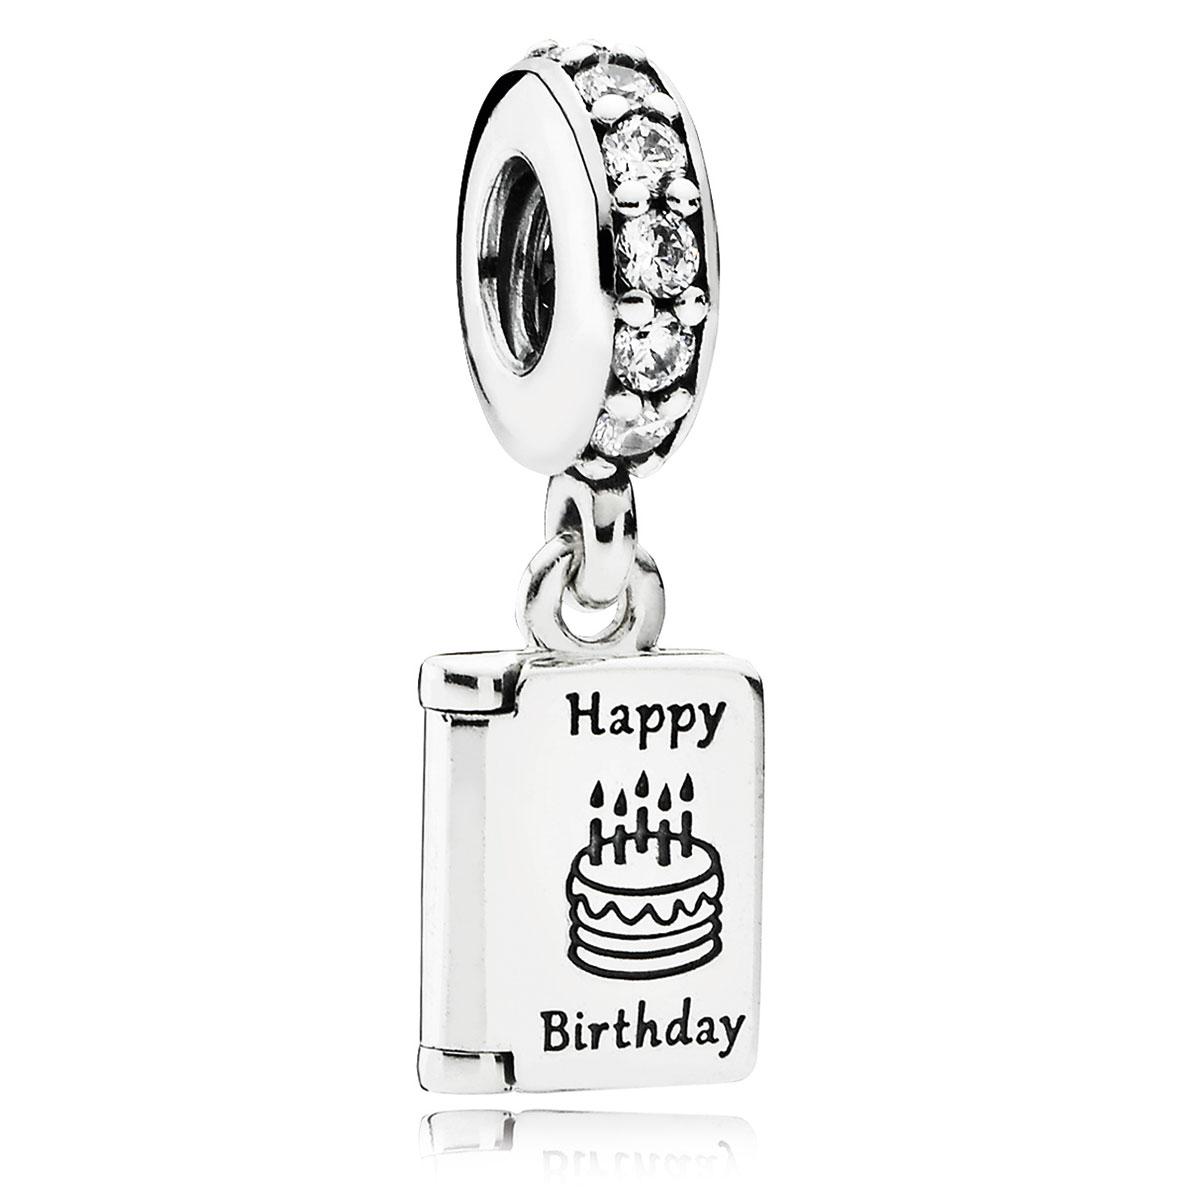 3f23ab90b PANDORA Birthday Wishes with Clear CZ Dangle - Pancharmbracelets.com